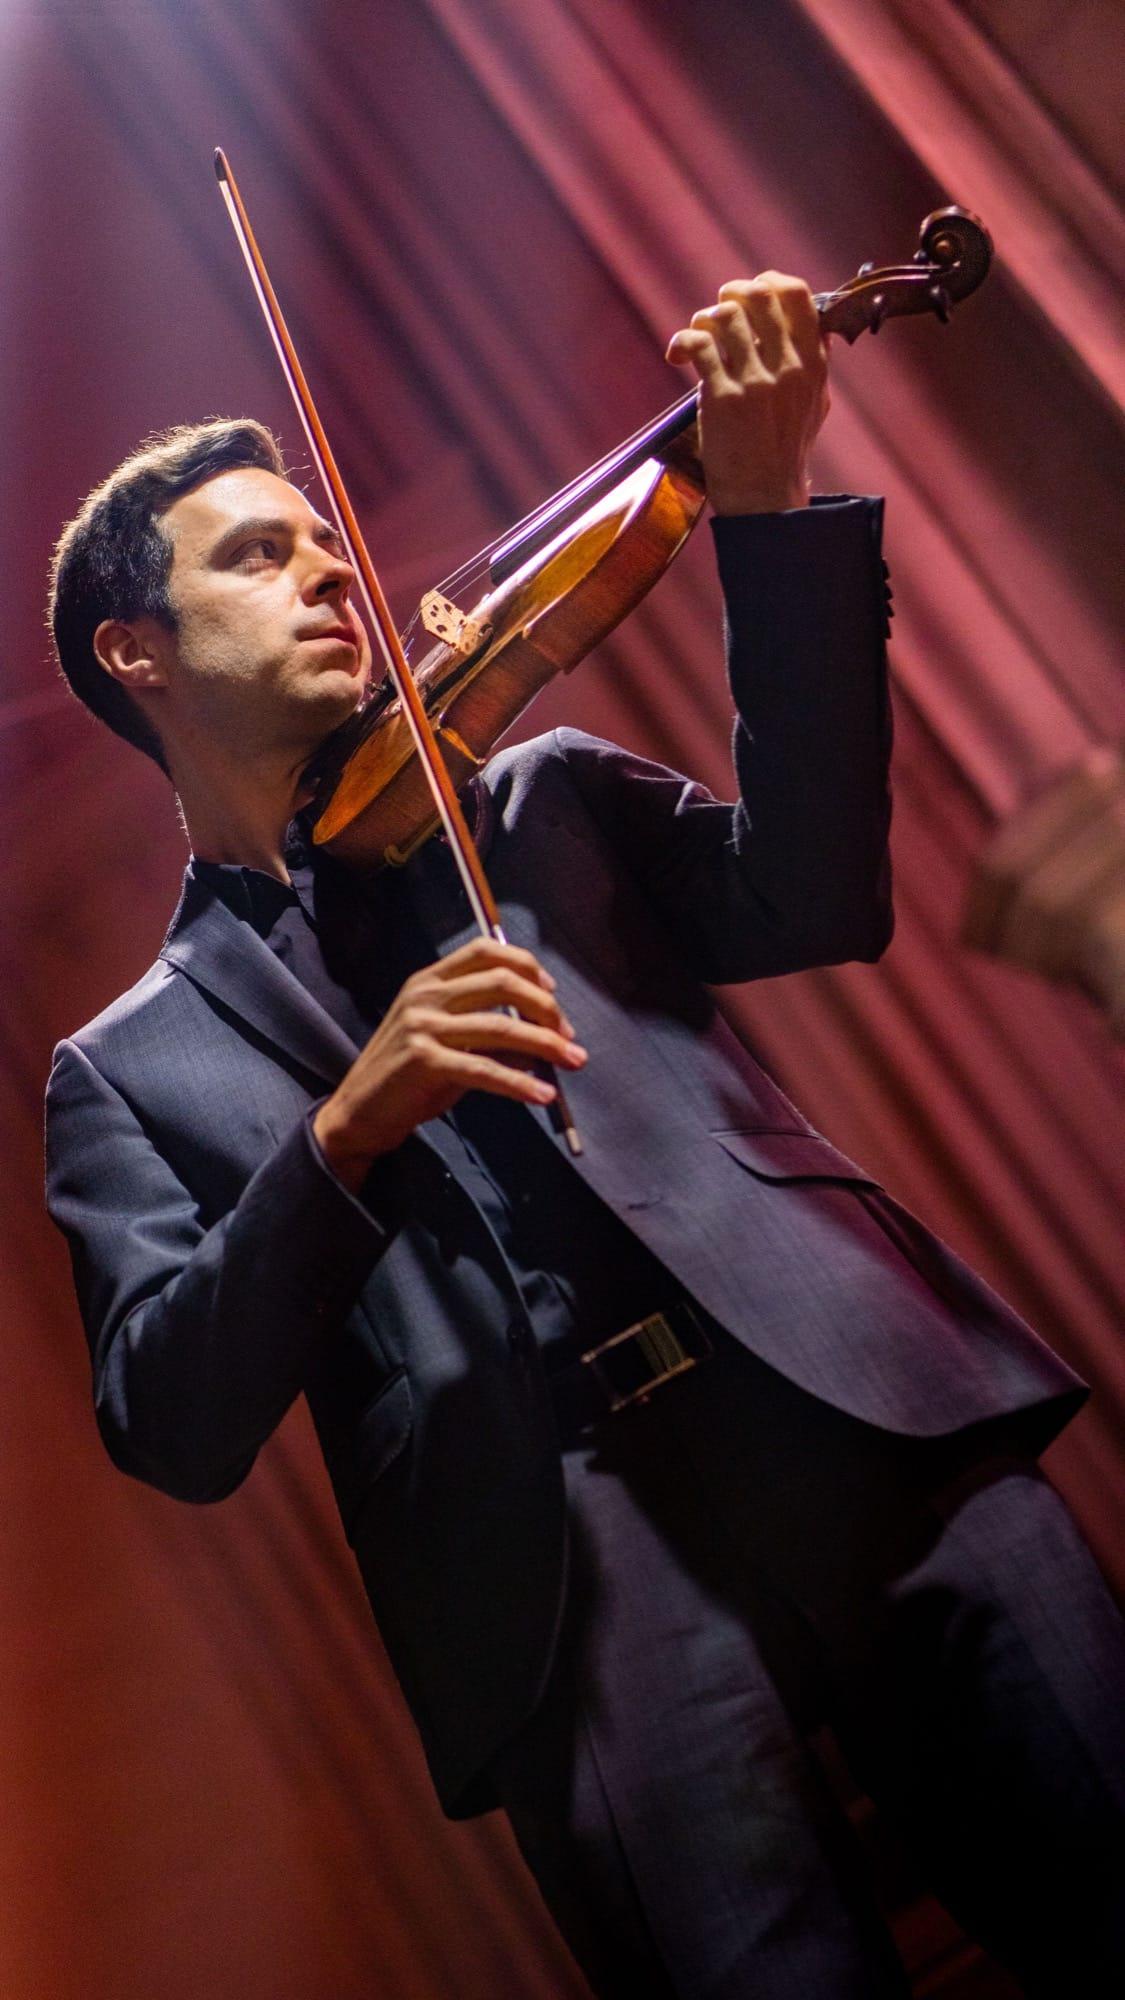 Leonard Furda Geiger Klassisches Konzert Wien